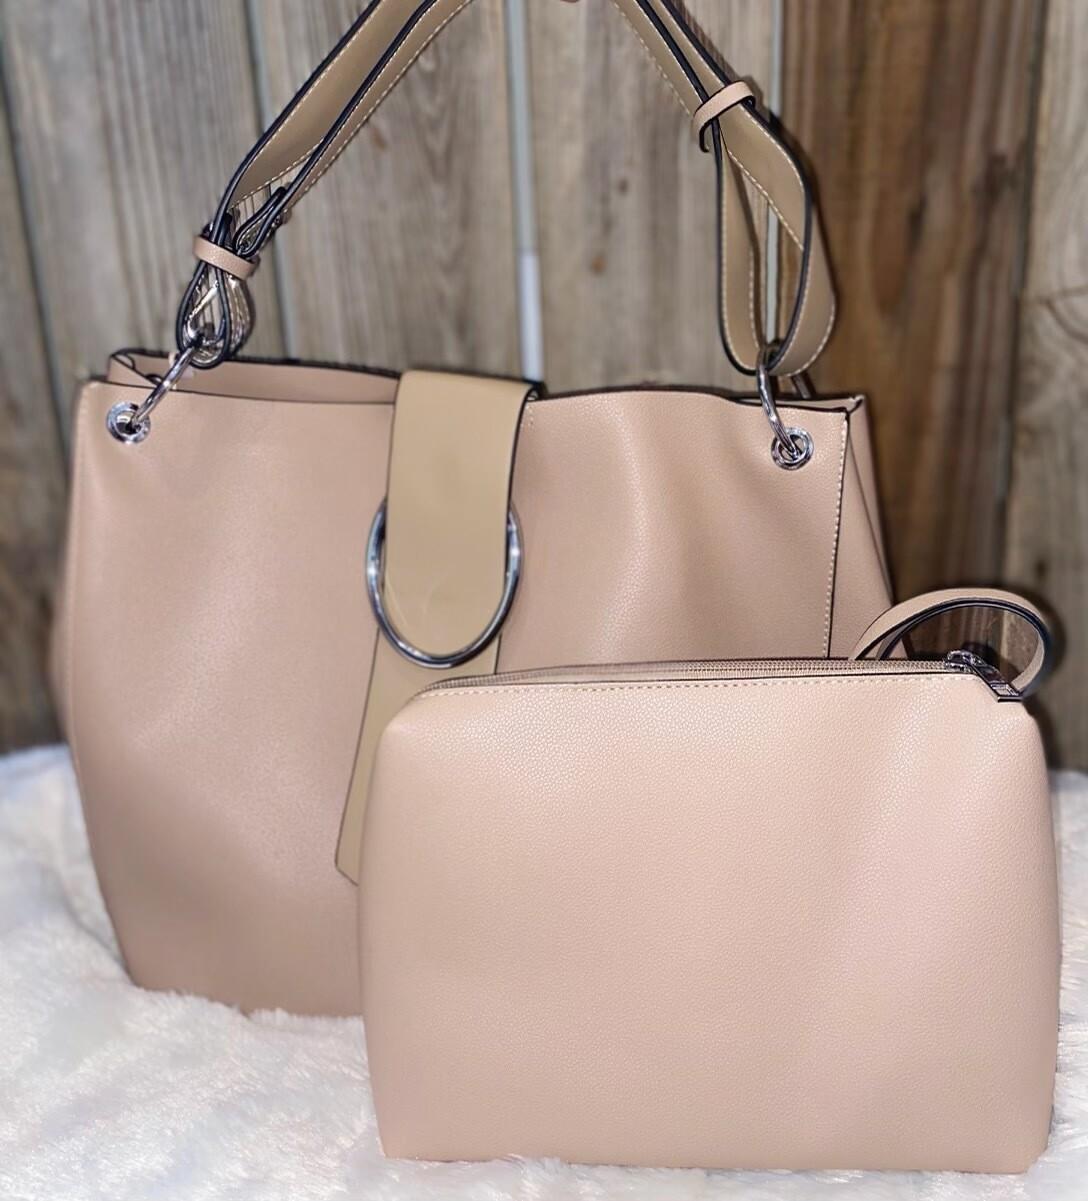 MW Slouchy Shoulder Bag with Buckle & Interior Bag, Latte